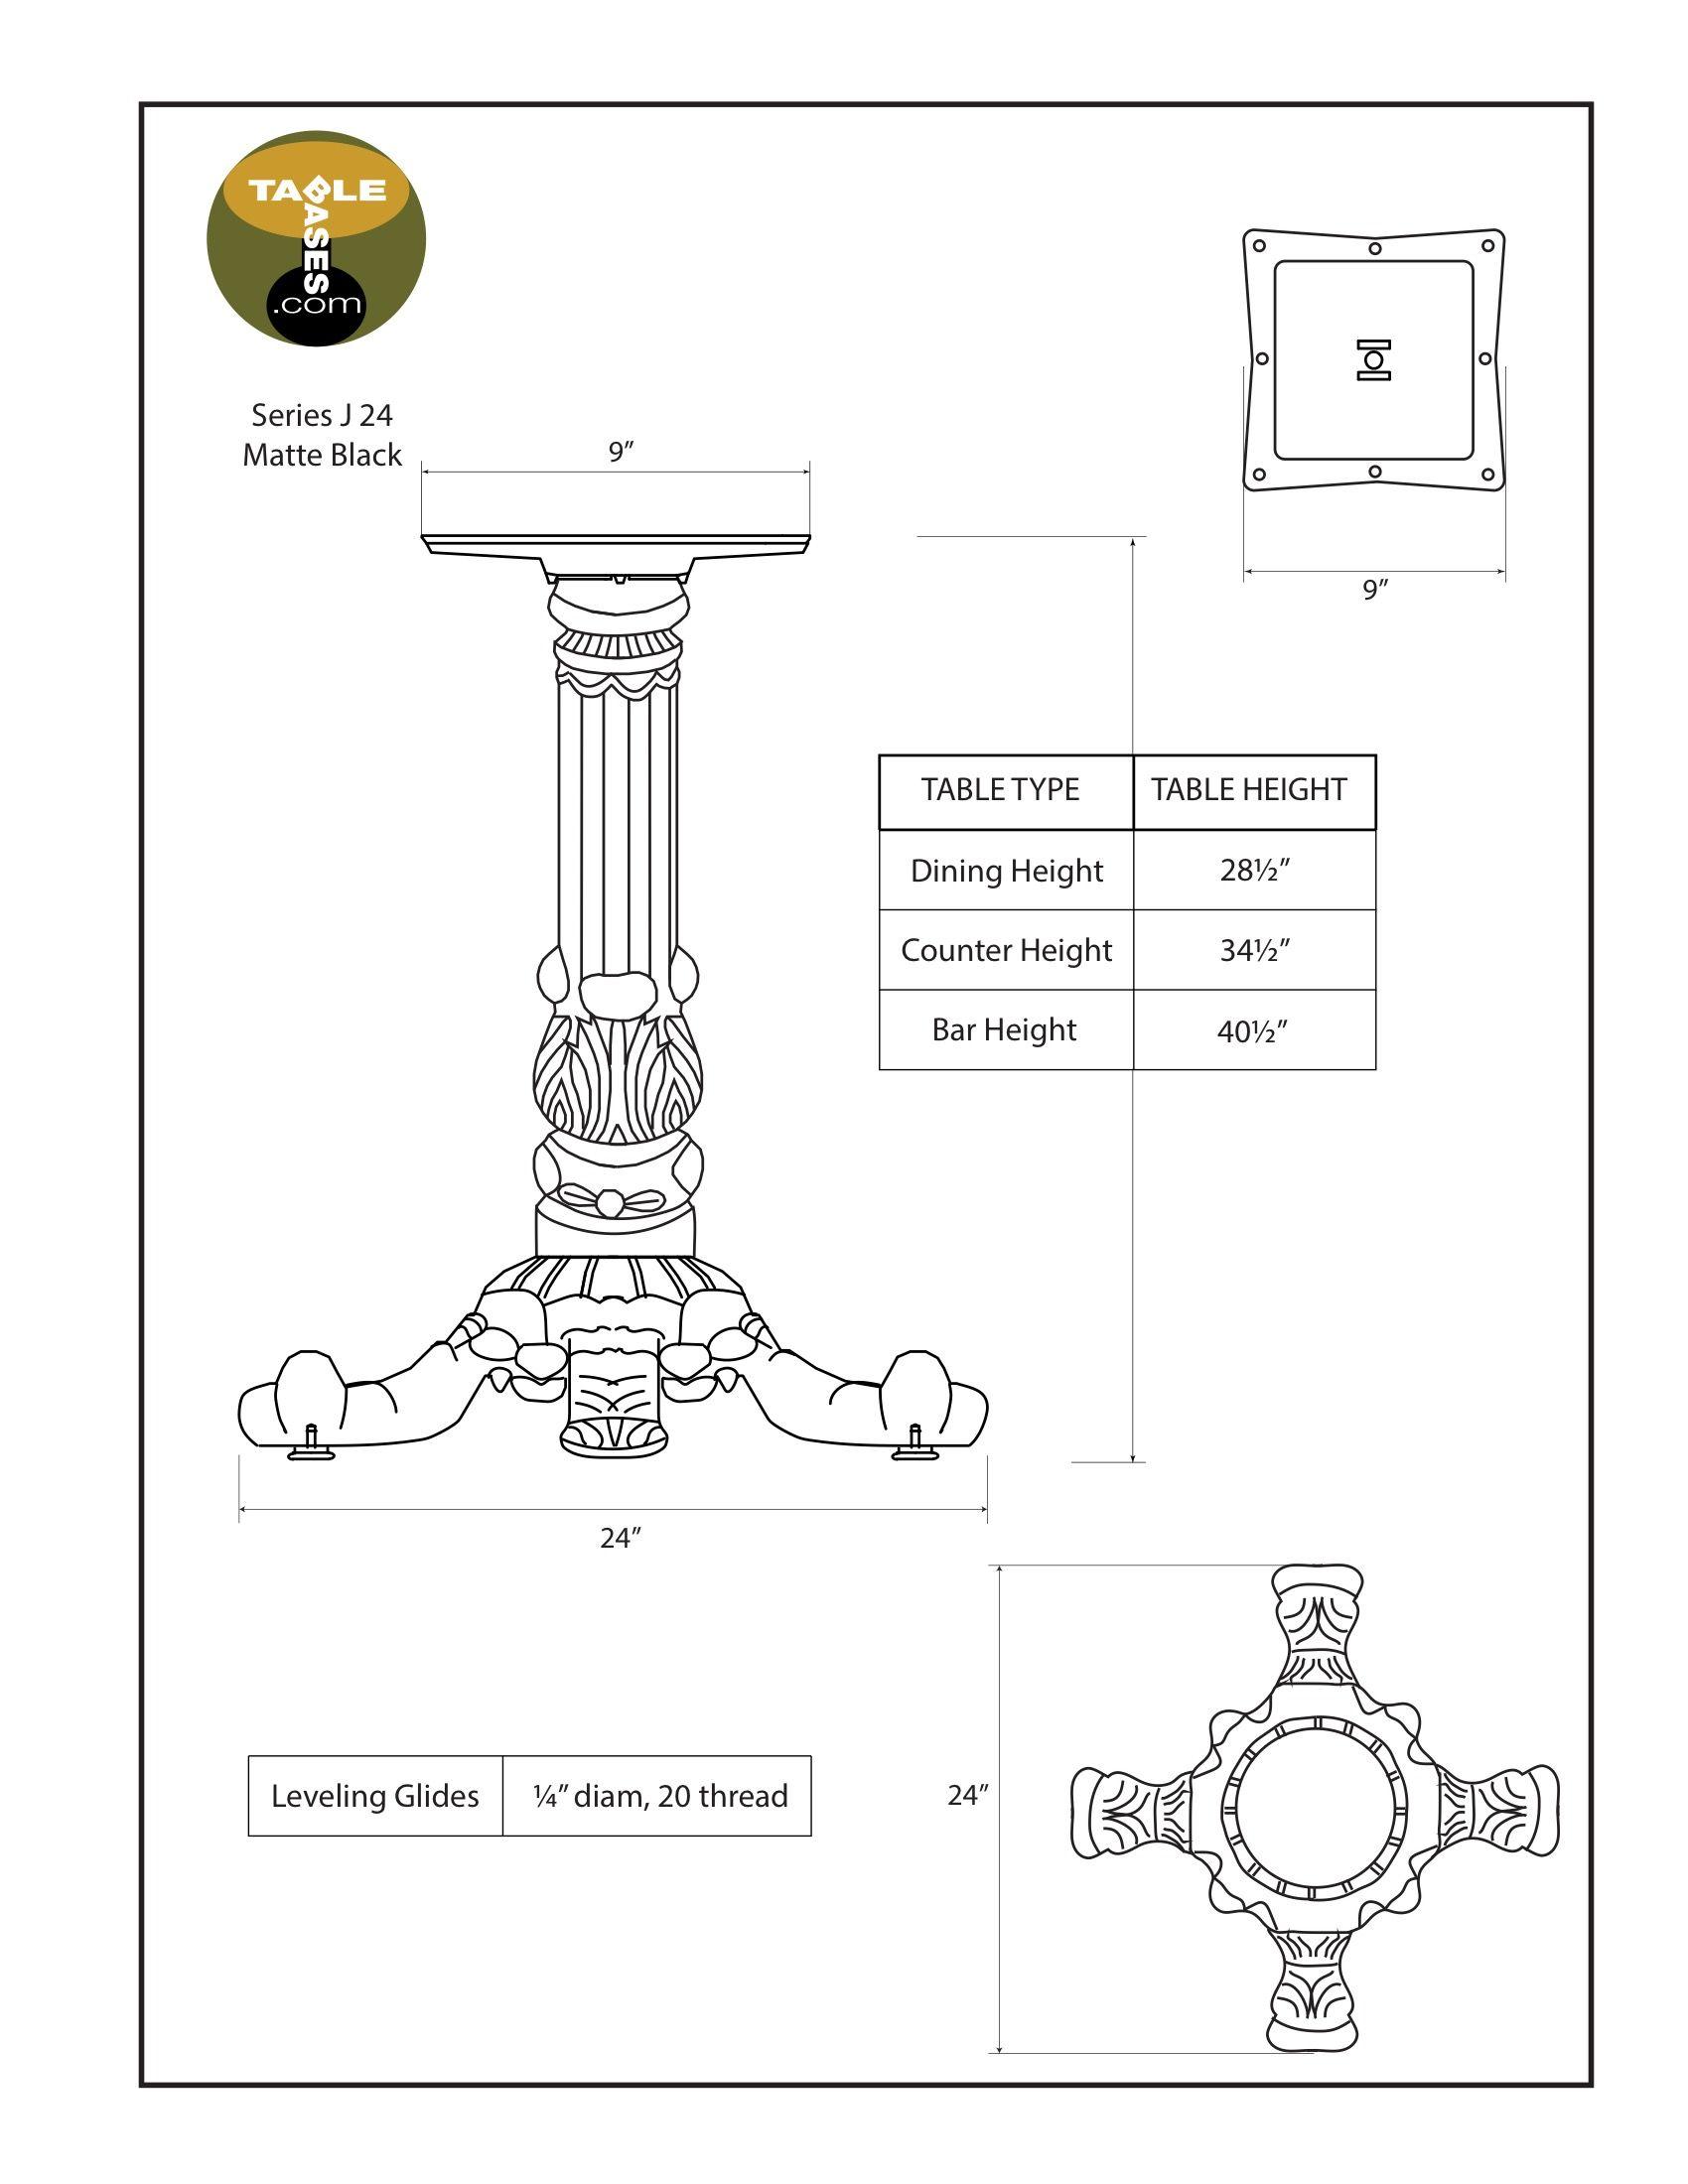 J24 Matte Black Table Base - Specifications